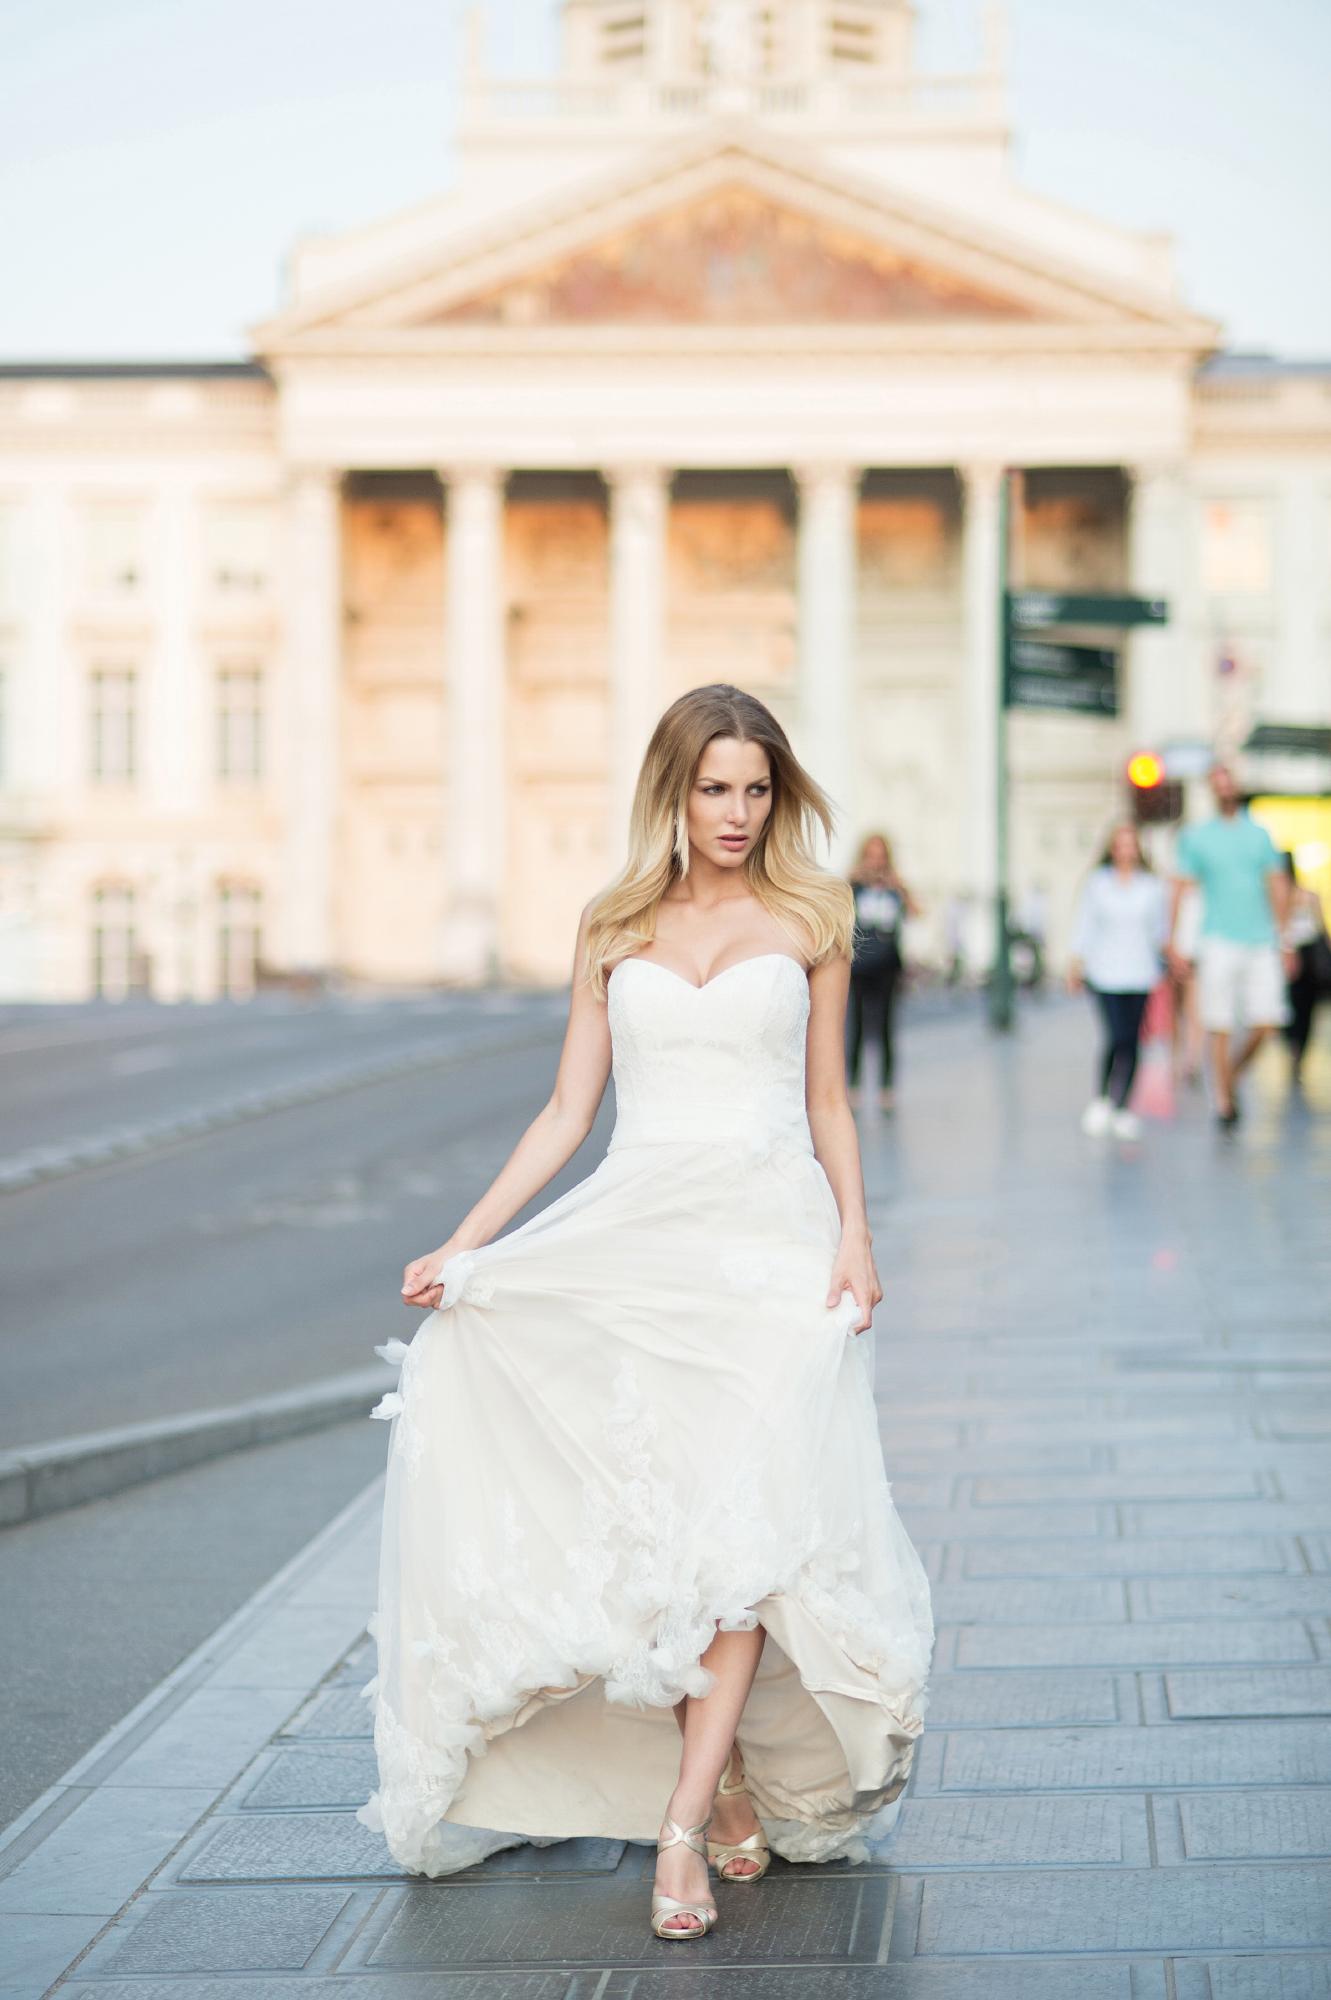 Naturelle Look Photography - Styled weddingshoot b005 website.jpg